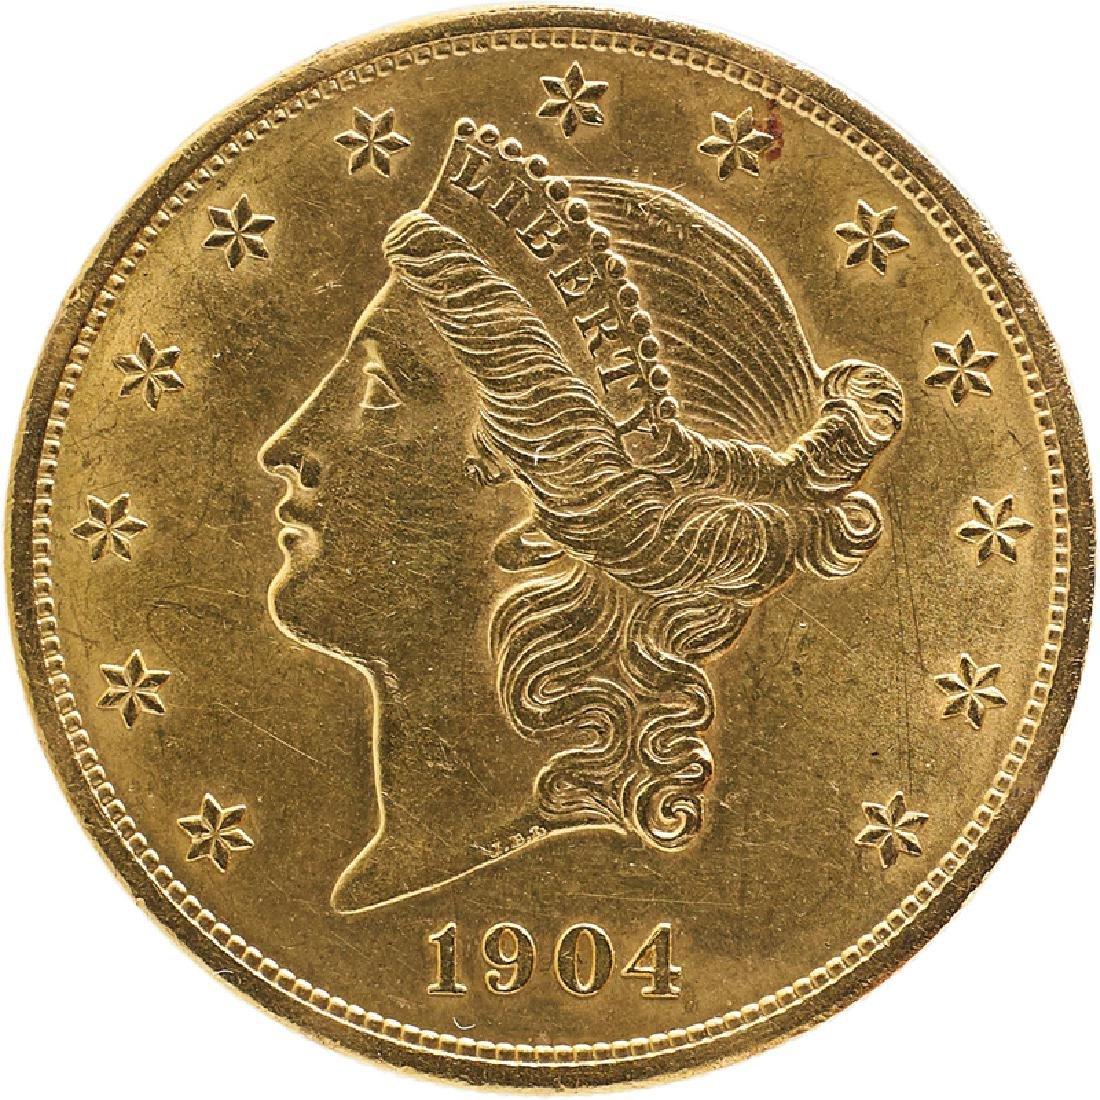 U.S. 1904 LIBERTY $20 GOLD COIN